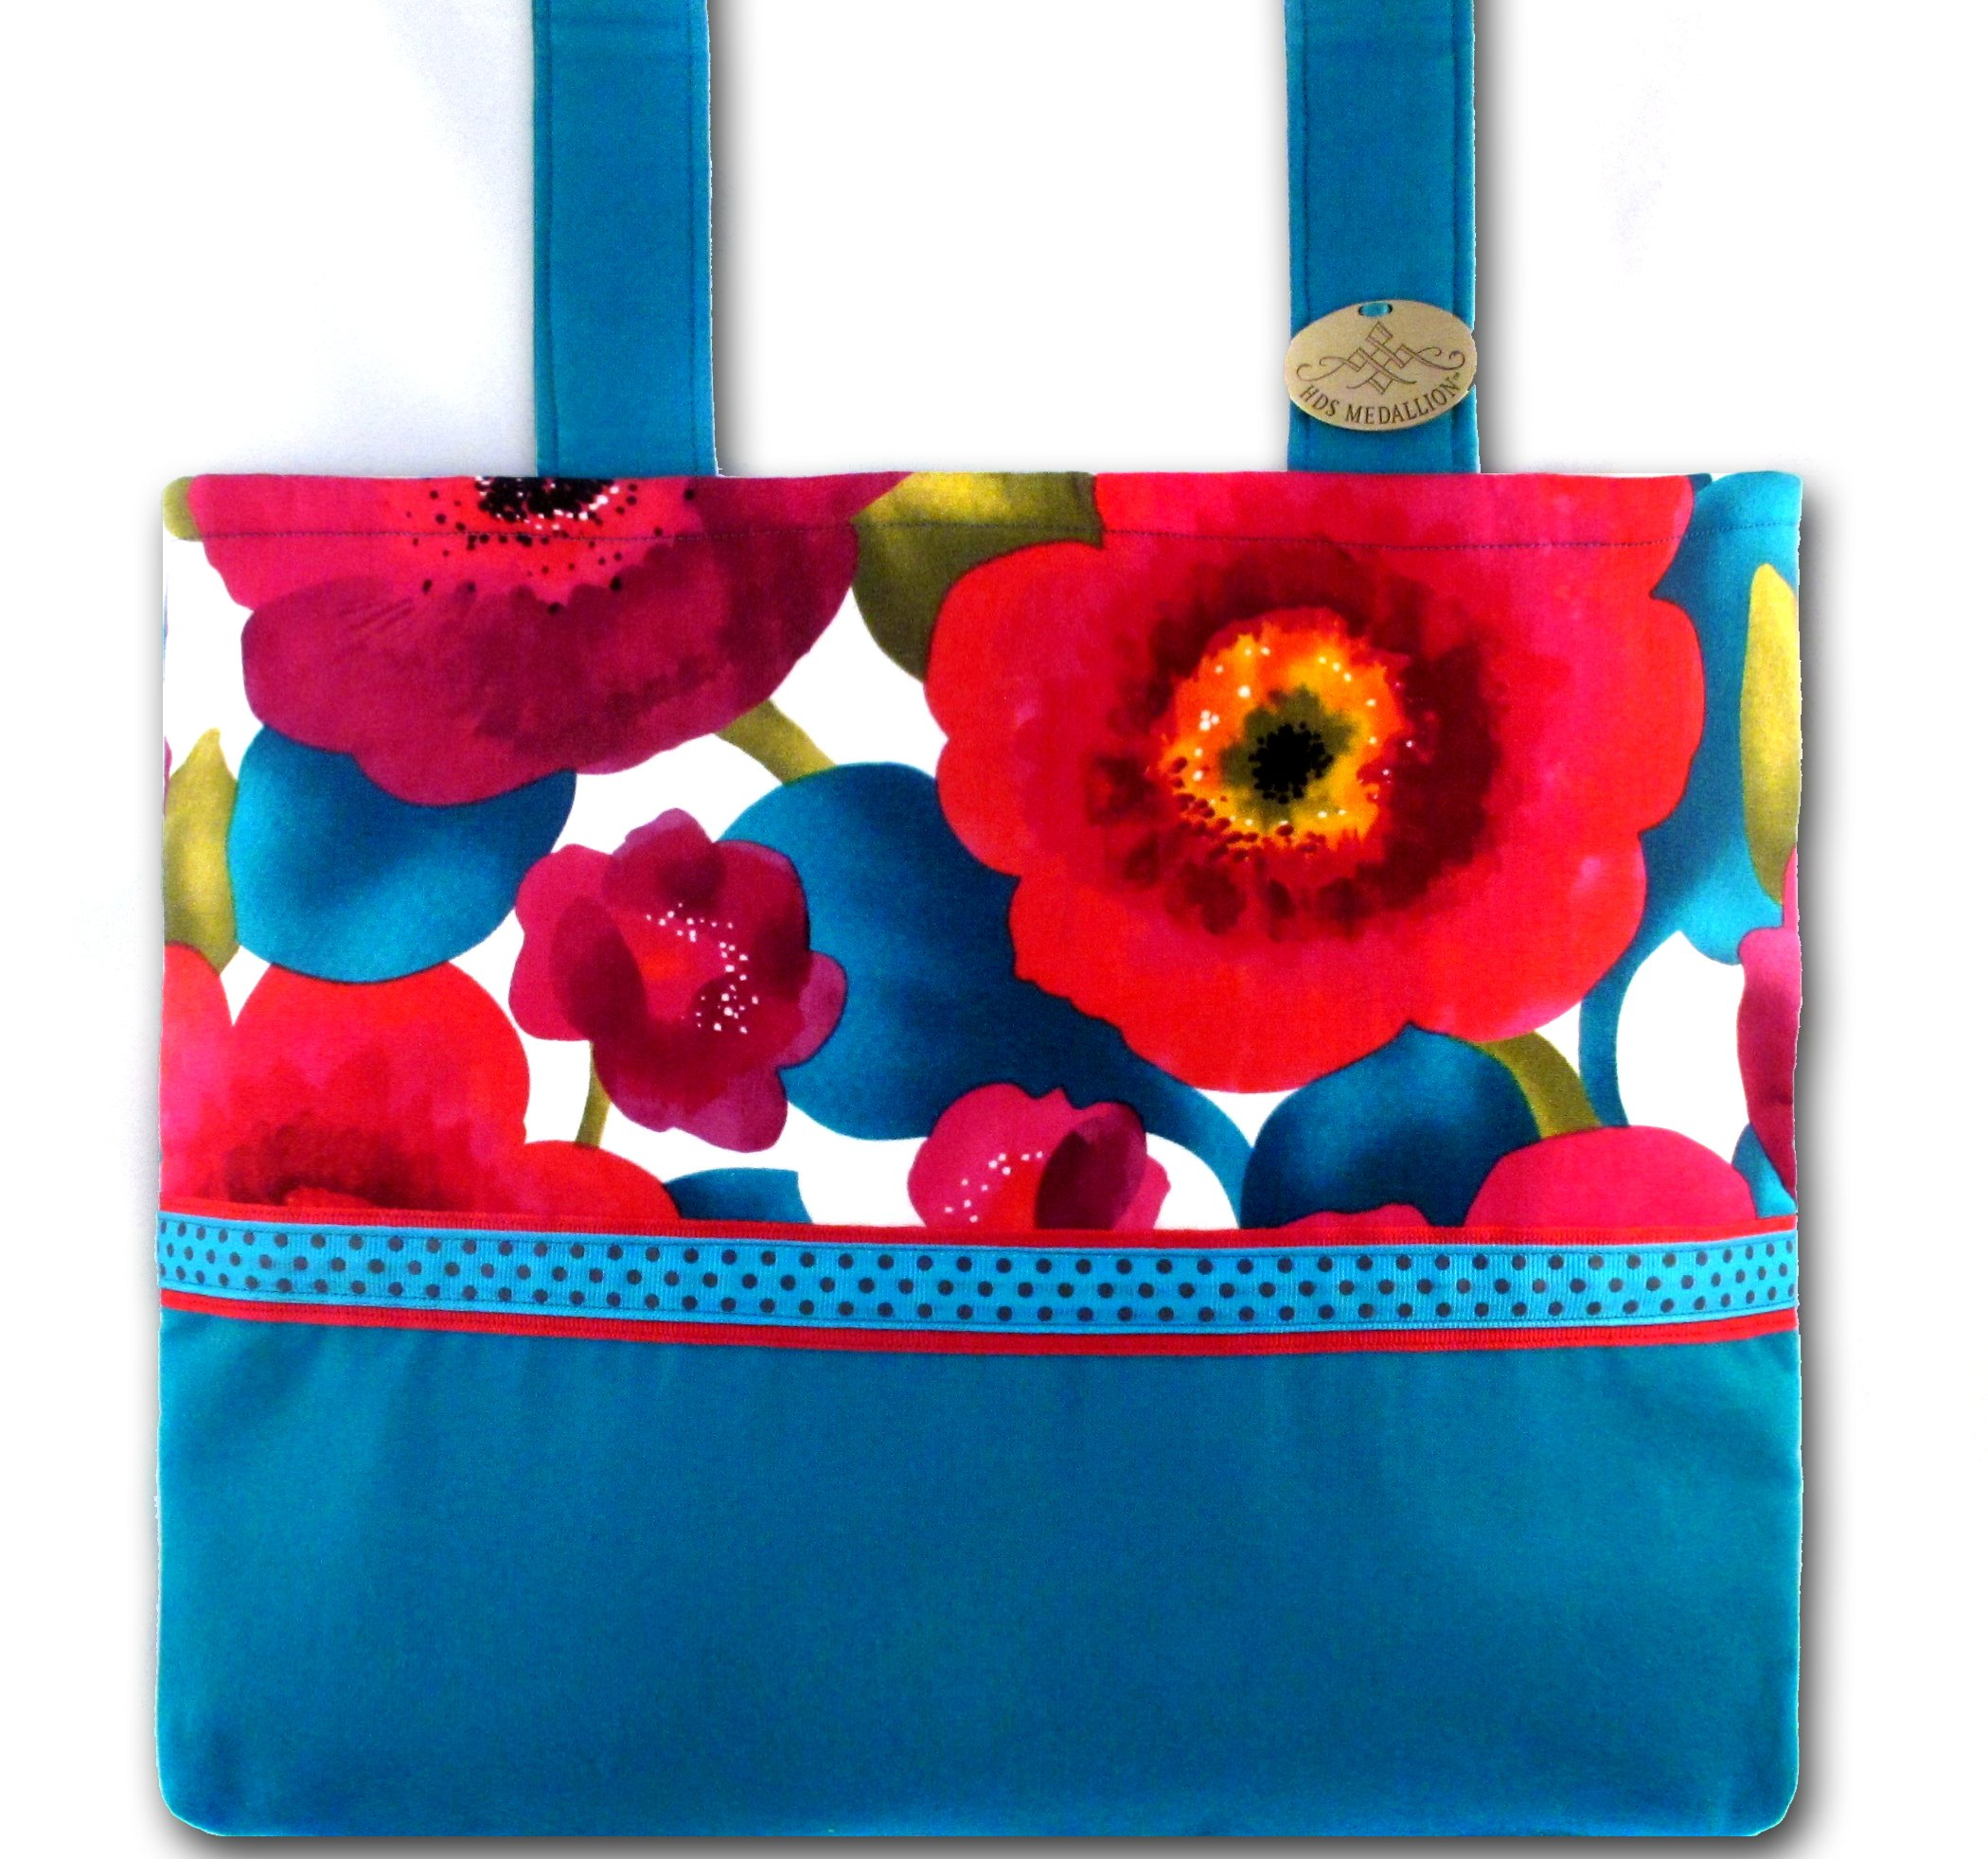 Poppy Punch Caribbean Blue - Bright Floral, Functional Walker Bag